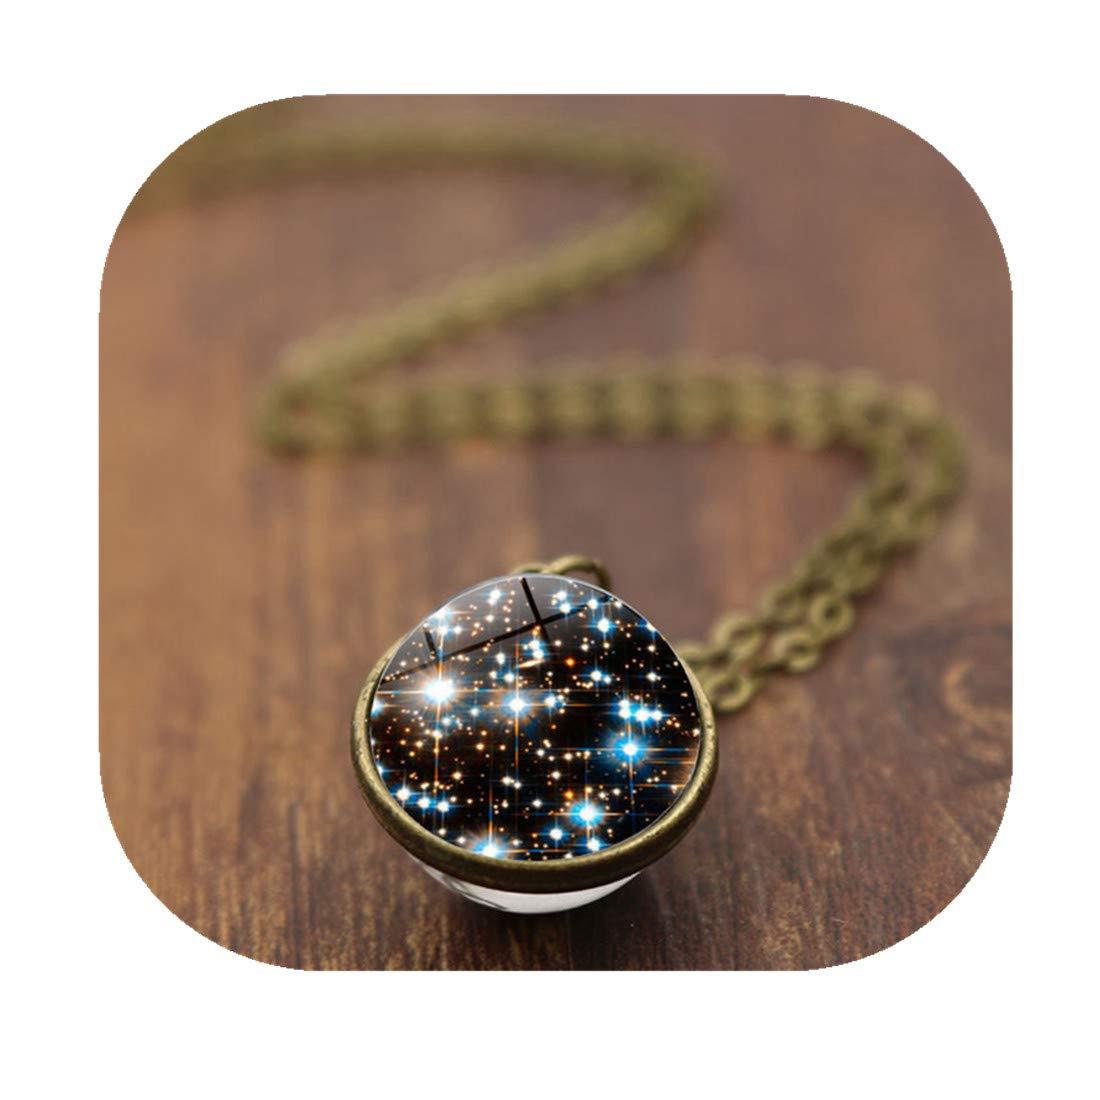 CHENCAN01 Nebula Necklace,Space Pendant,Galaxy Necklace,Galaxy Pendant,Glass Dome Necklace,Universe Pendant (Bronze & 16mm)